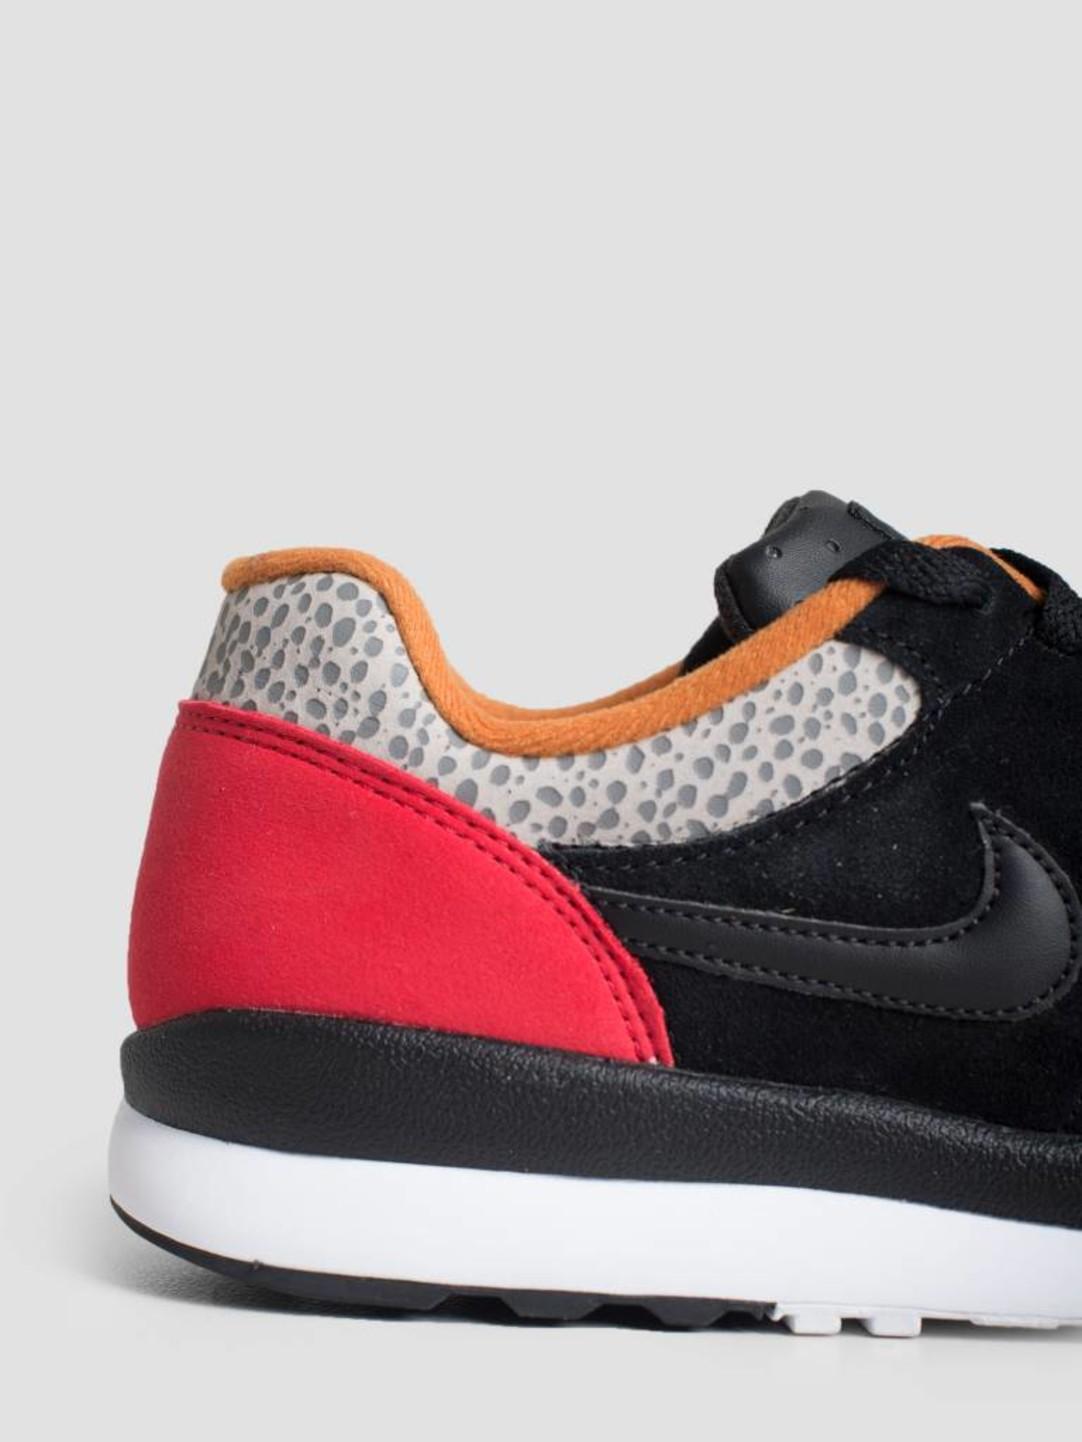 Nike Nike Air Safari Se University Red Black Monarch Cobblestone Bq8418-600